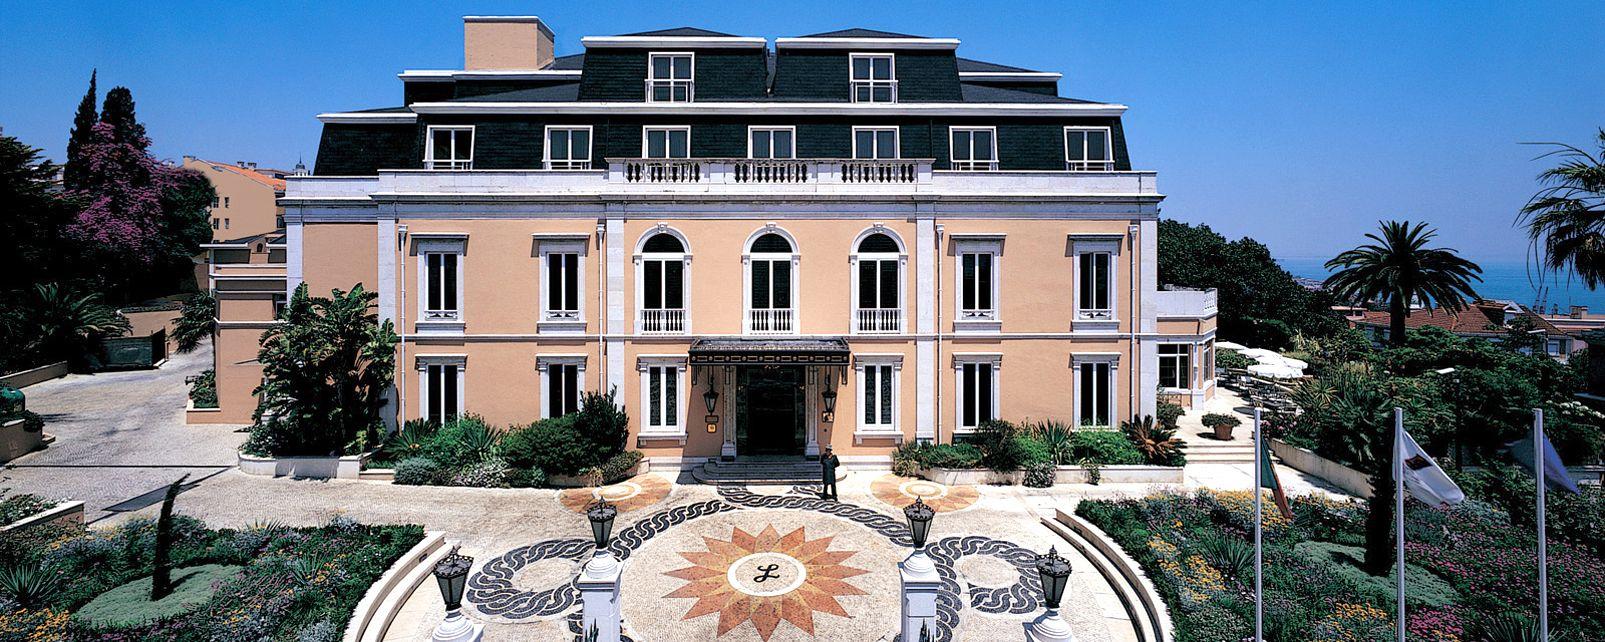 Hôtel Olissippo Lapa Palace